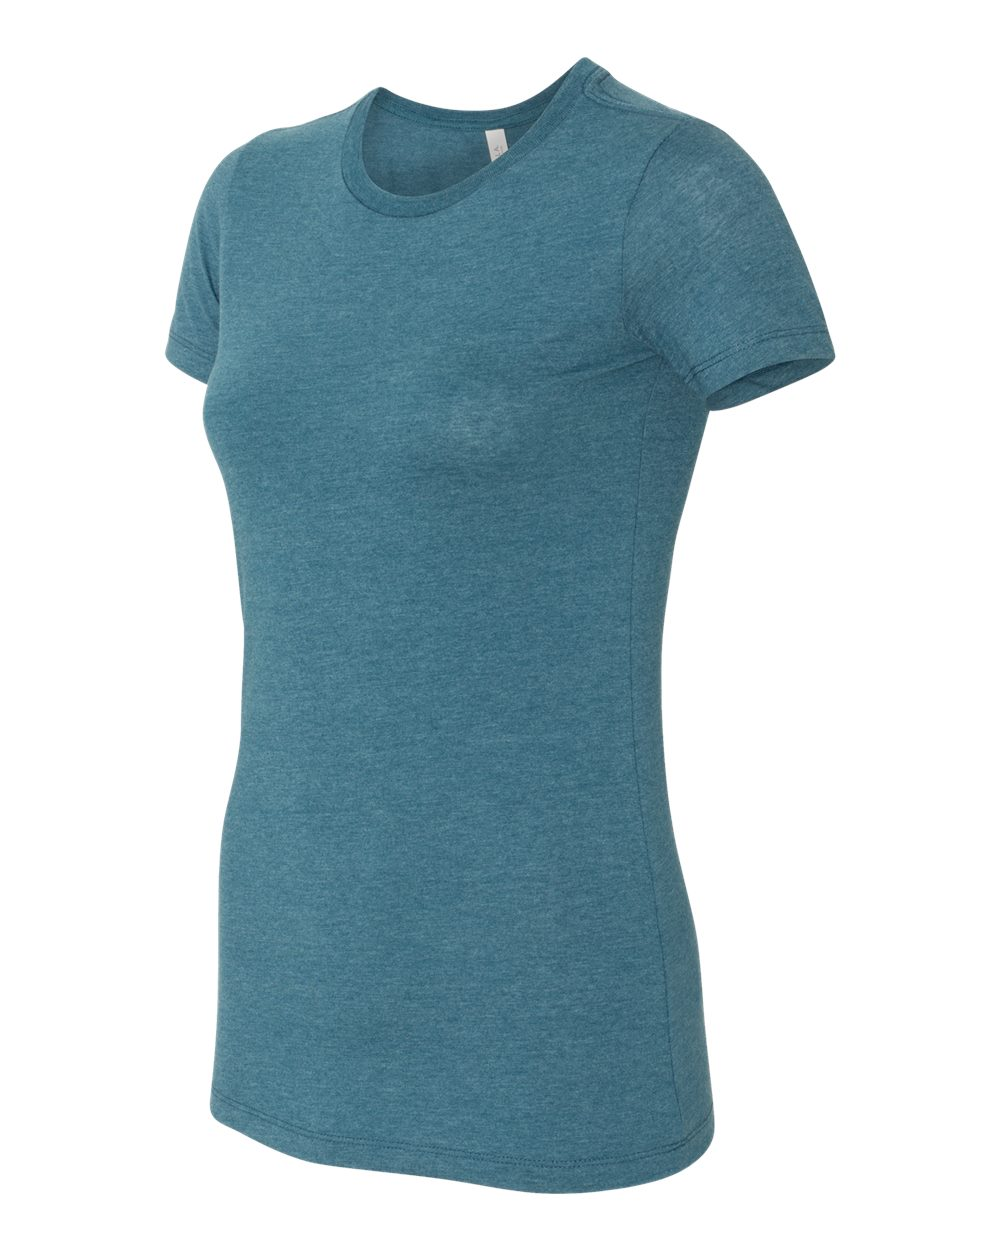 Bella-Canvas-Women-039-s-Favorite-T-Shirt-6004-S-2XL thumbnail 156